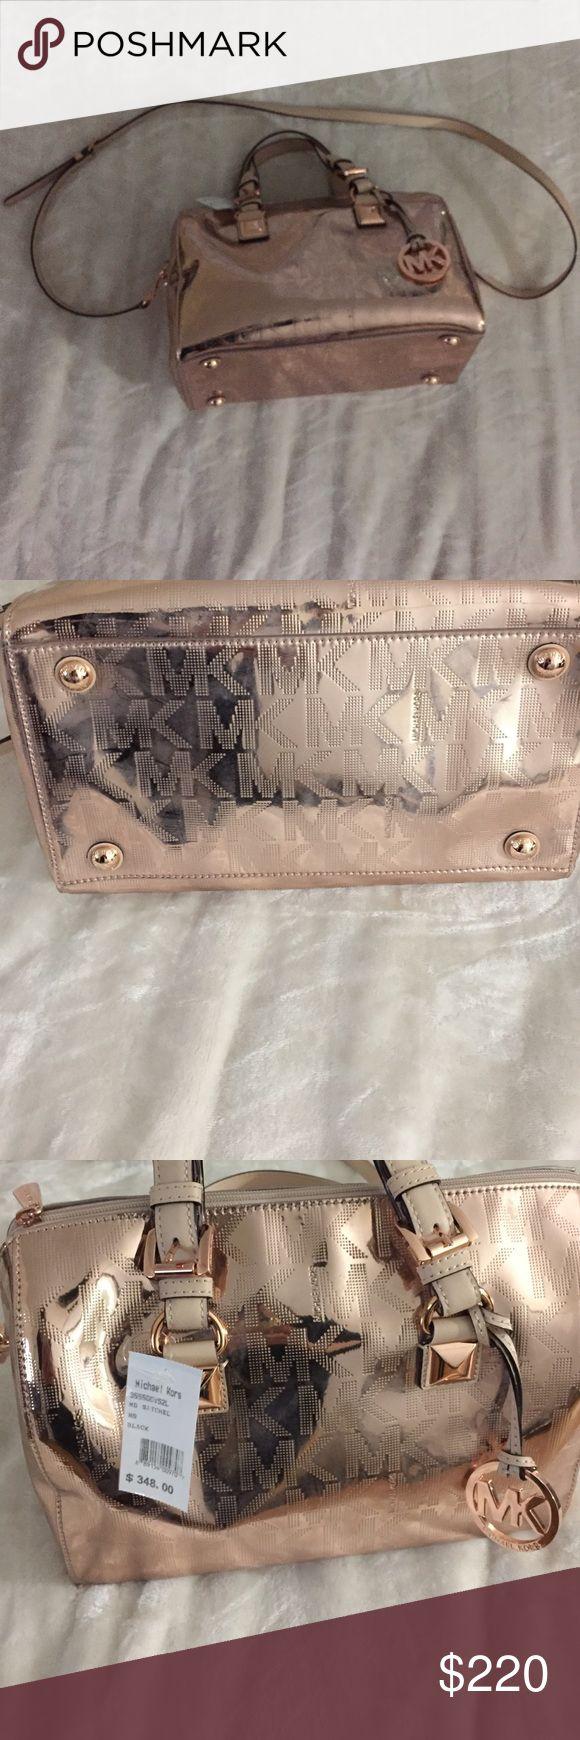 Michael Kors Metallic Satchel Brand new Michael Kors Metallic Bowler bag. Price tag attached. Never used. Comes along with cross body.  Original price $348 Michael Kors Bags Satchels